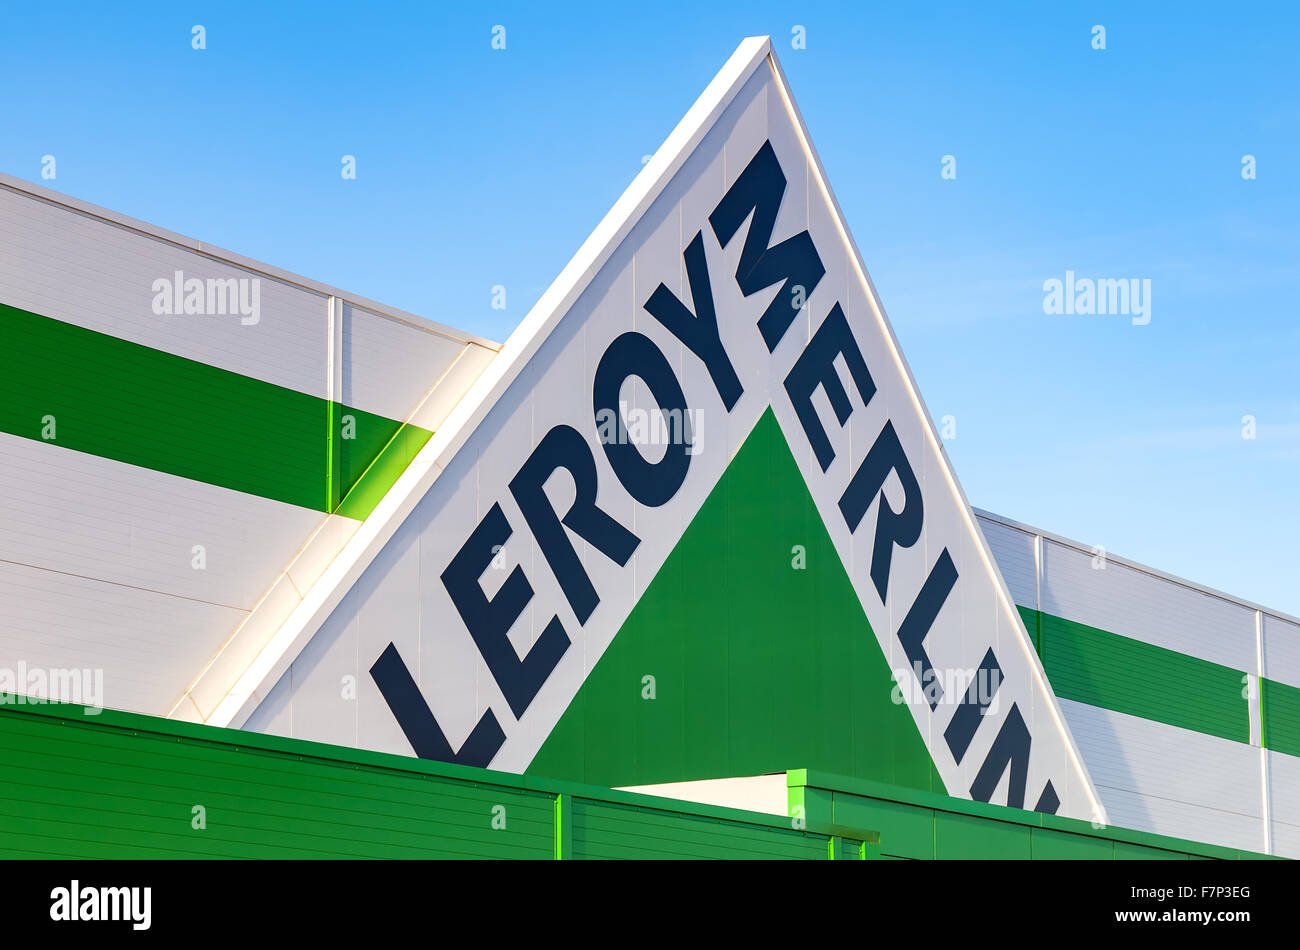 Leroy merlin brand sign against blue sky stock photo: 90840136 alamy